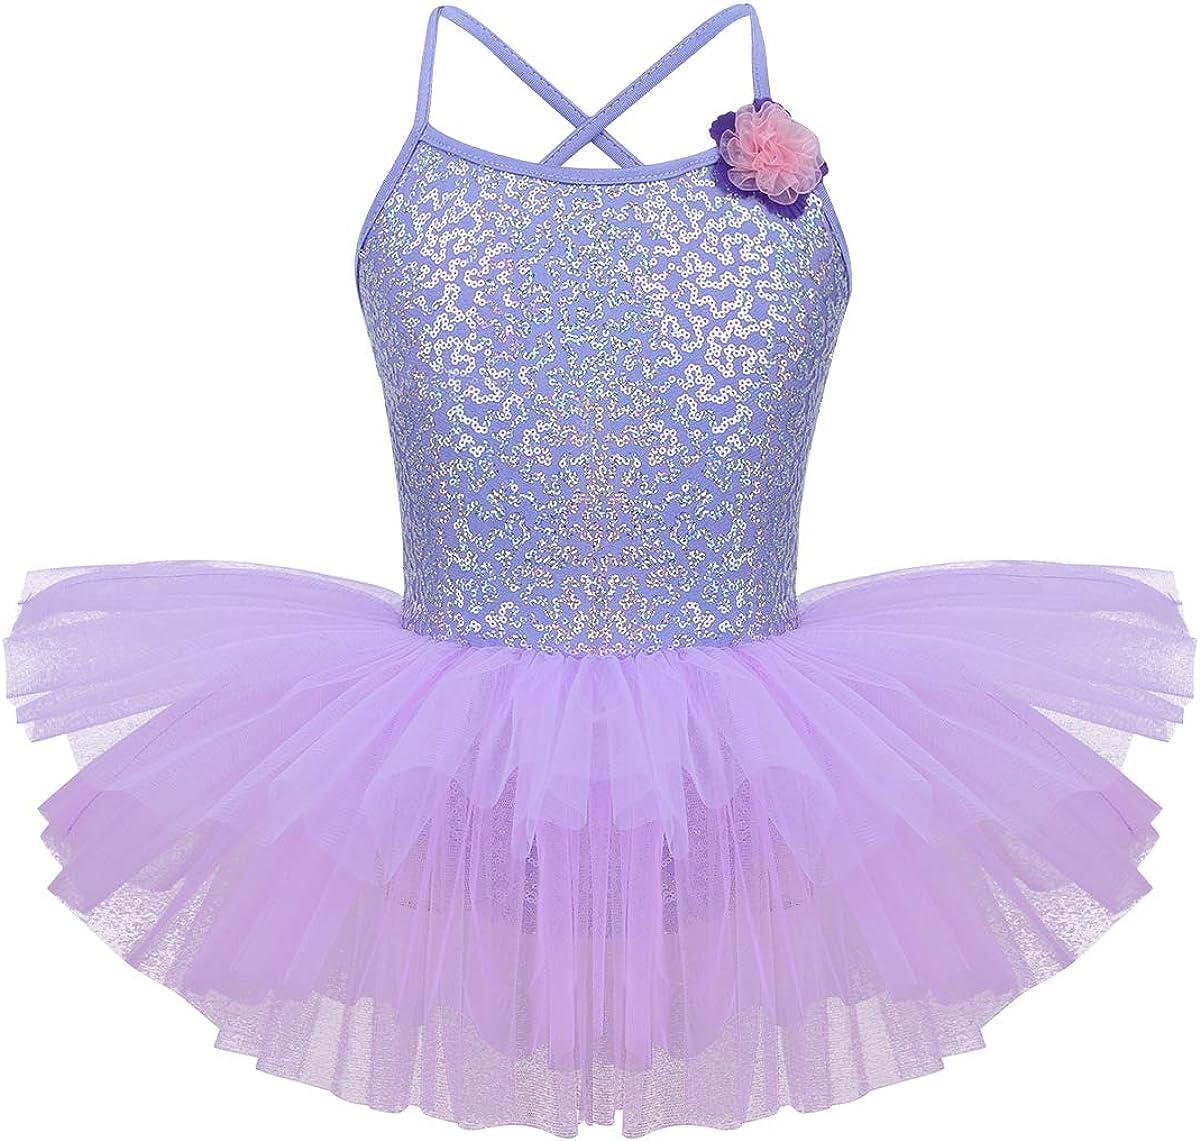 dPois Maillot de Ballet Niña Tutú Vestido Lentejuelas Flores Traje de Baile Leotardo con Falda Malla Gimnasia Disfraz Bailarina Hada Ropa de Ballet Actuacion Fiesta Navidad Carnaval